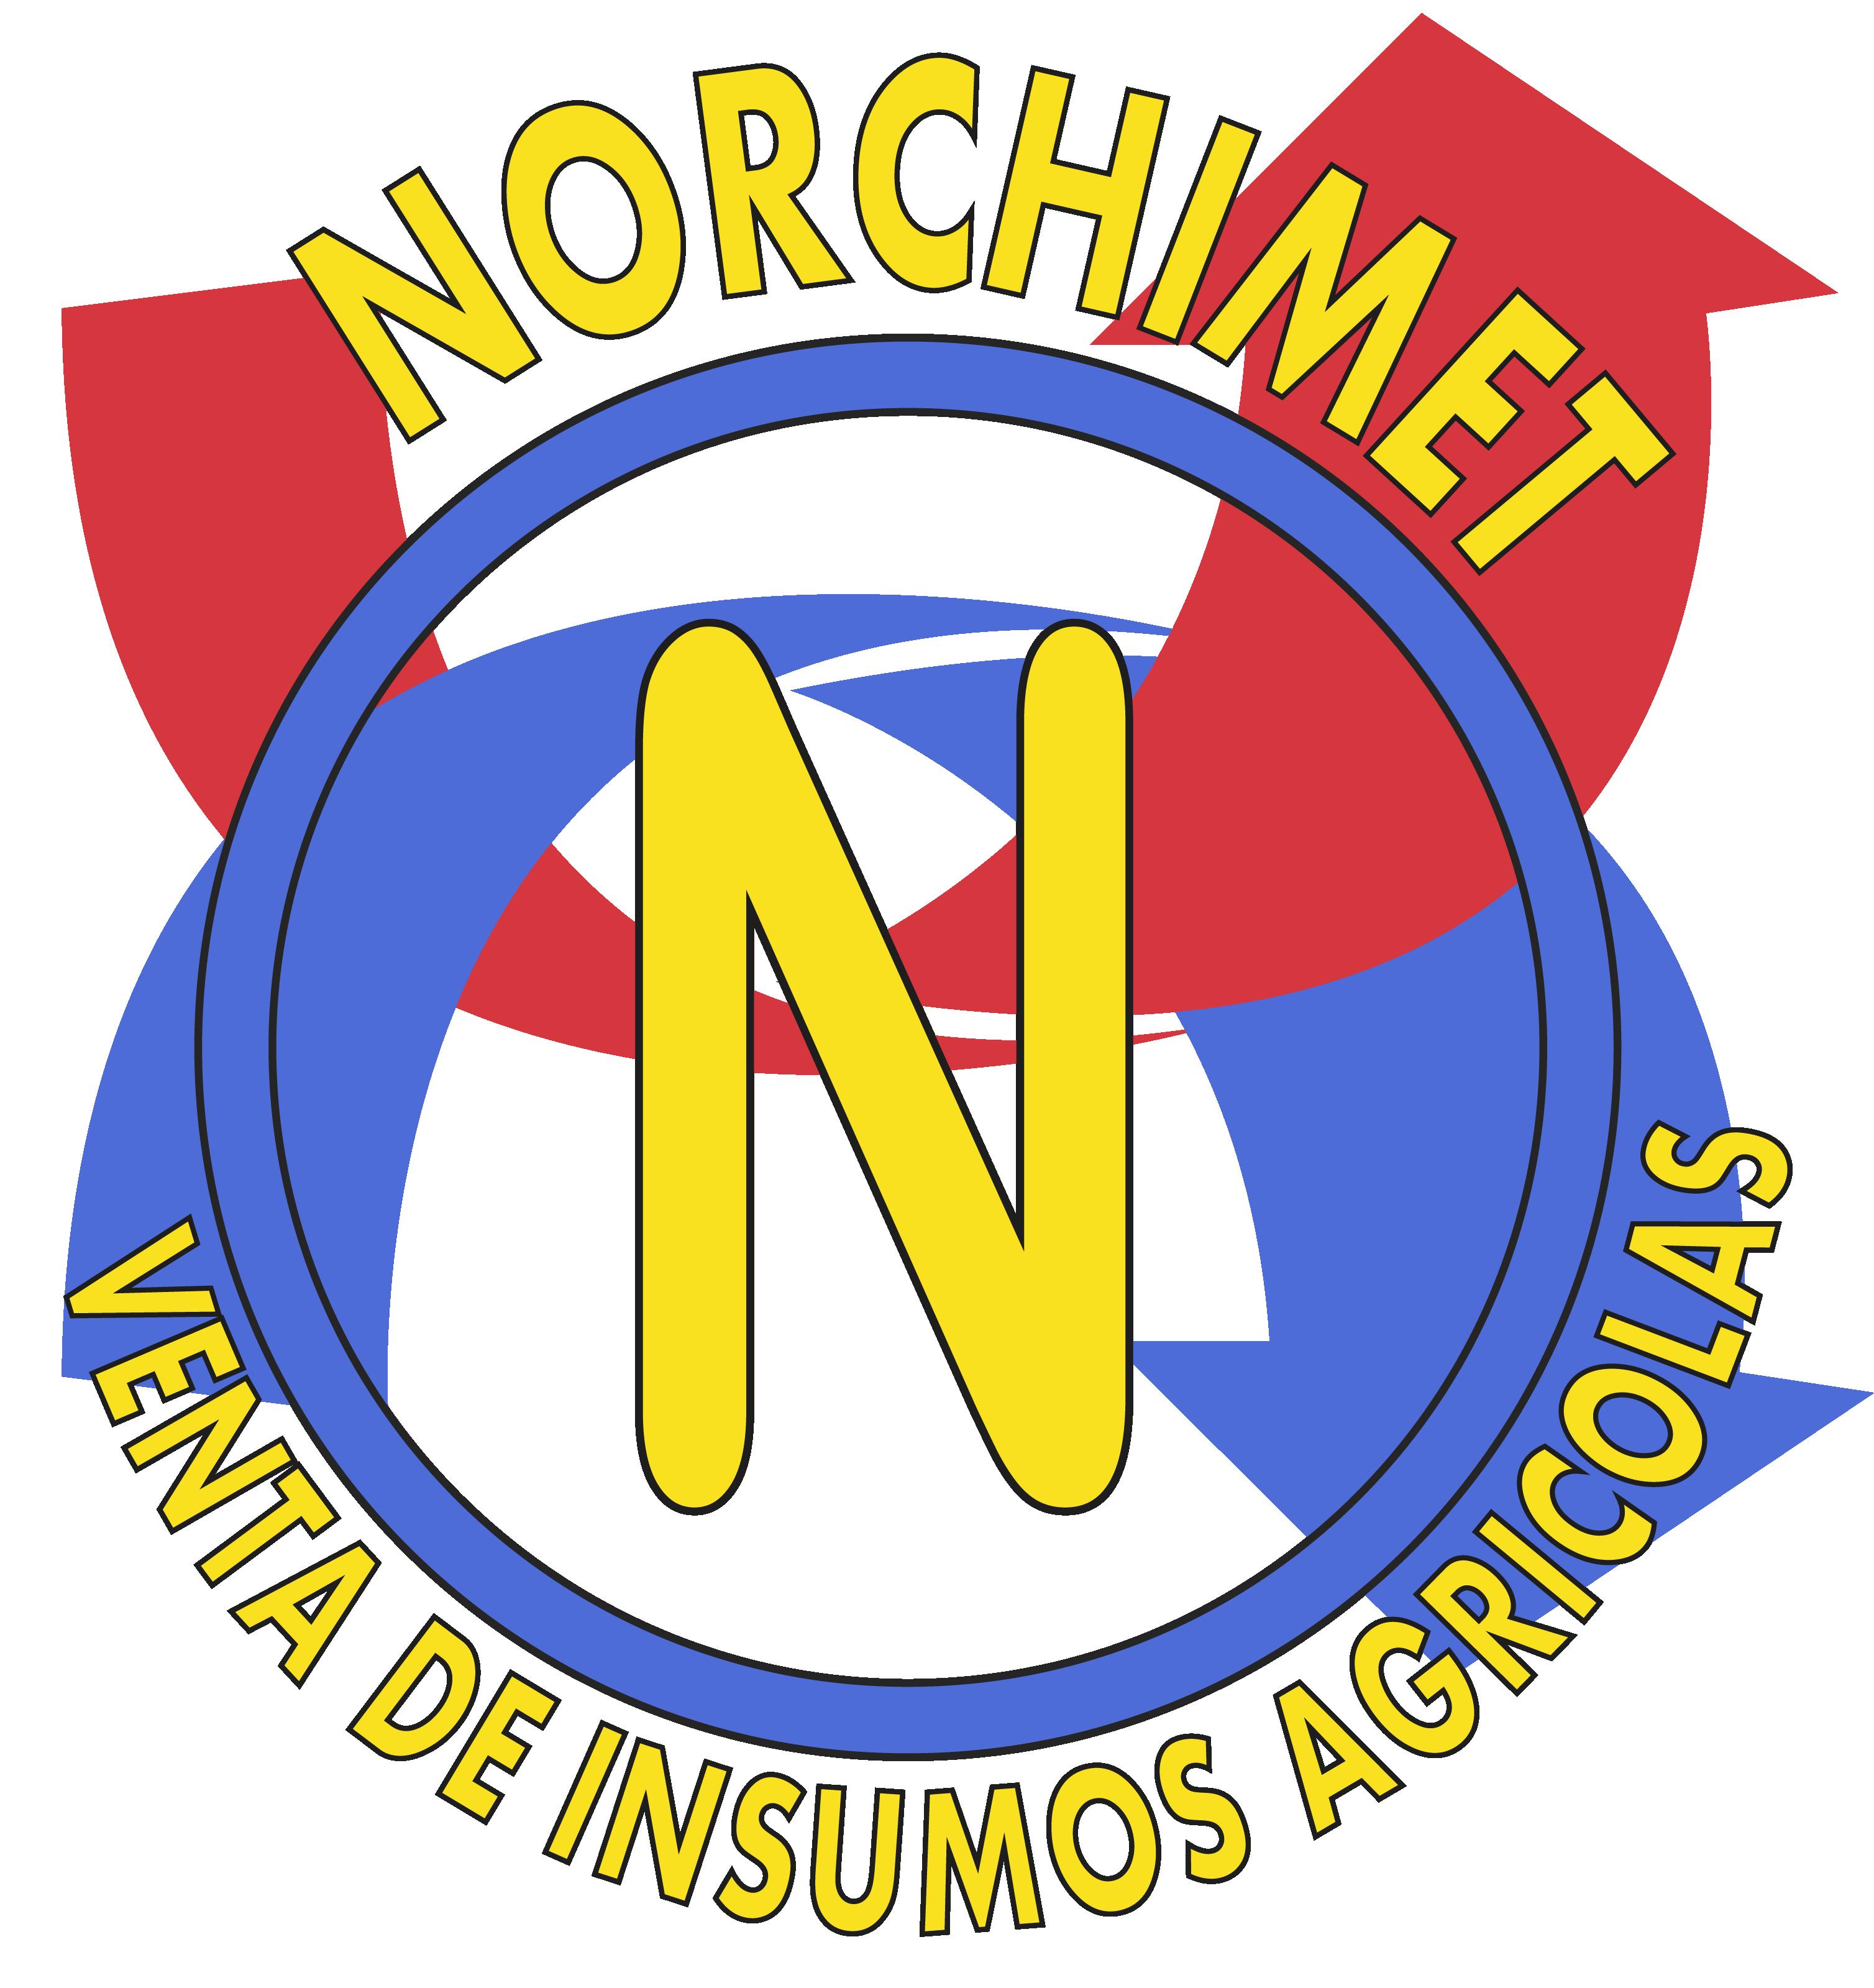 Norchimet